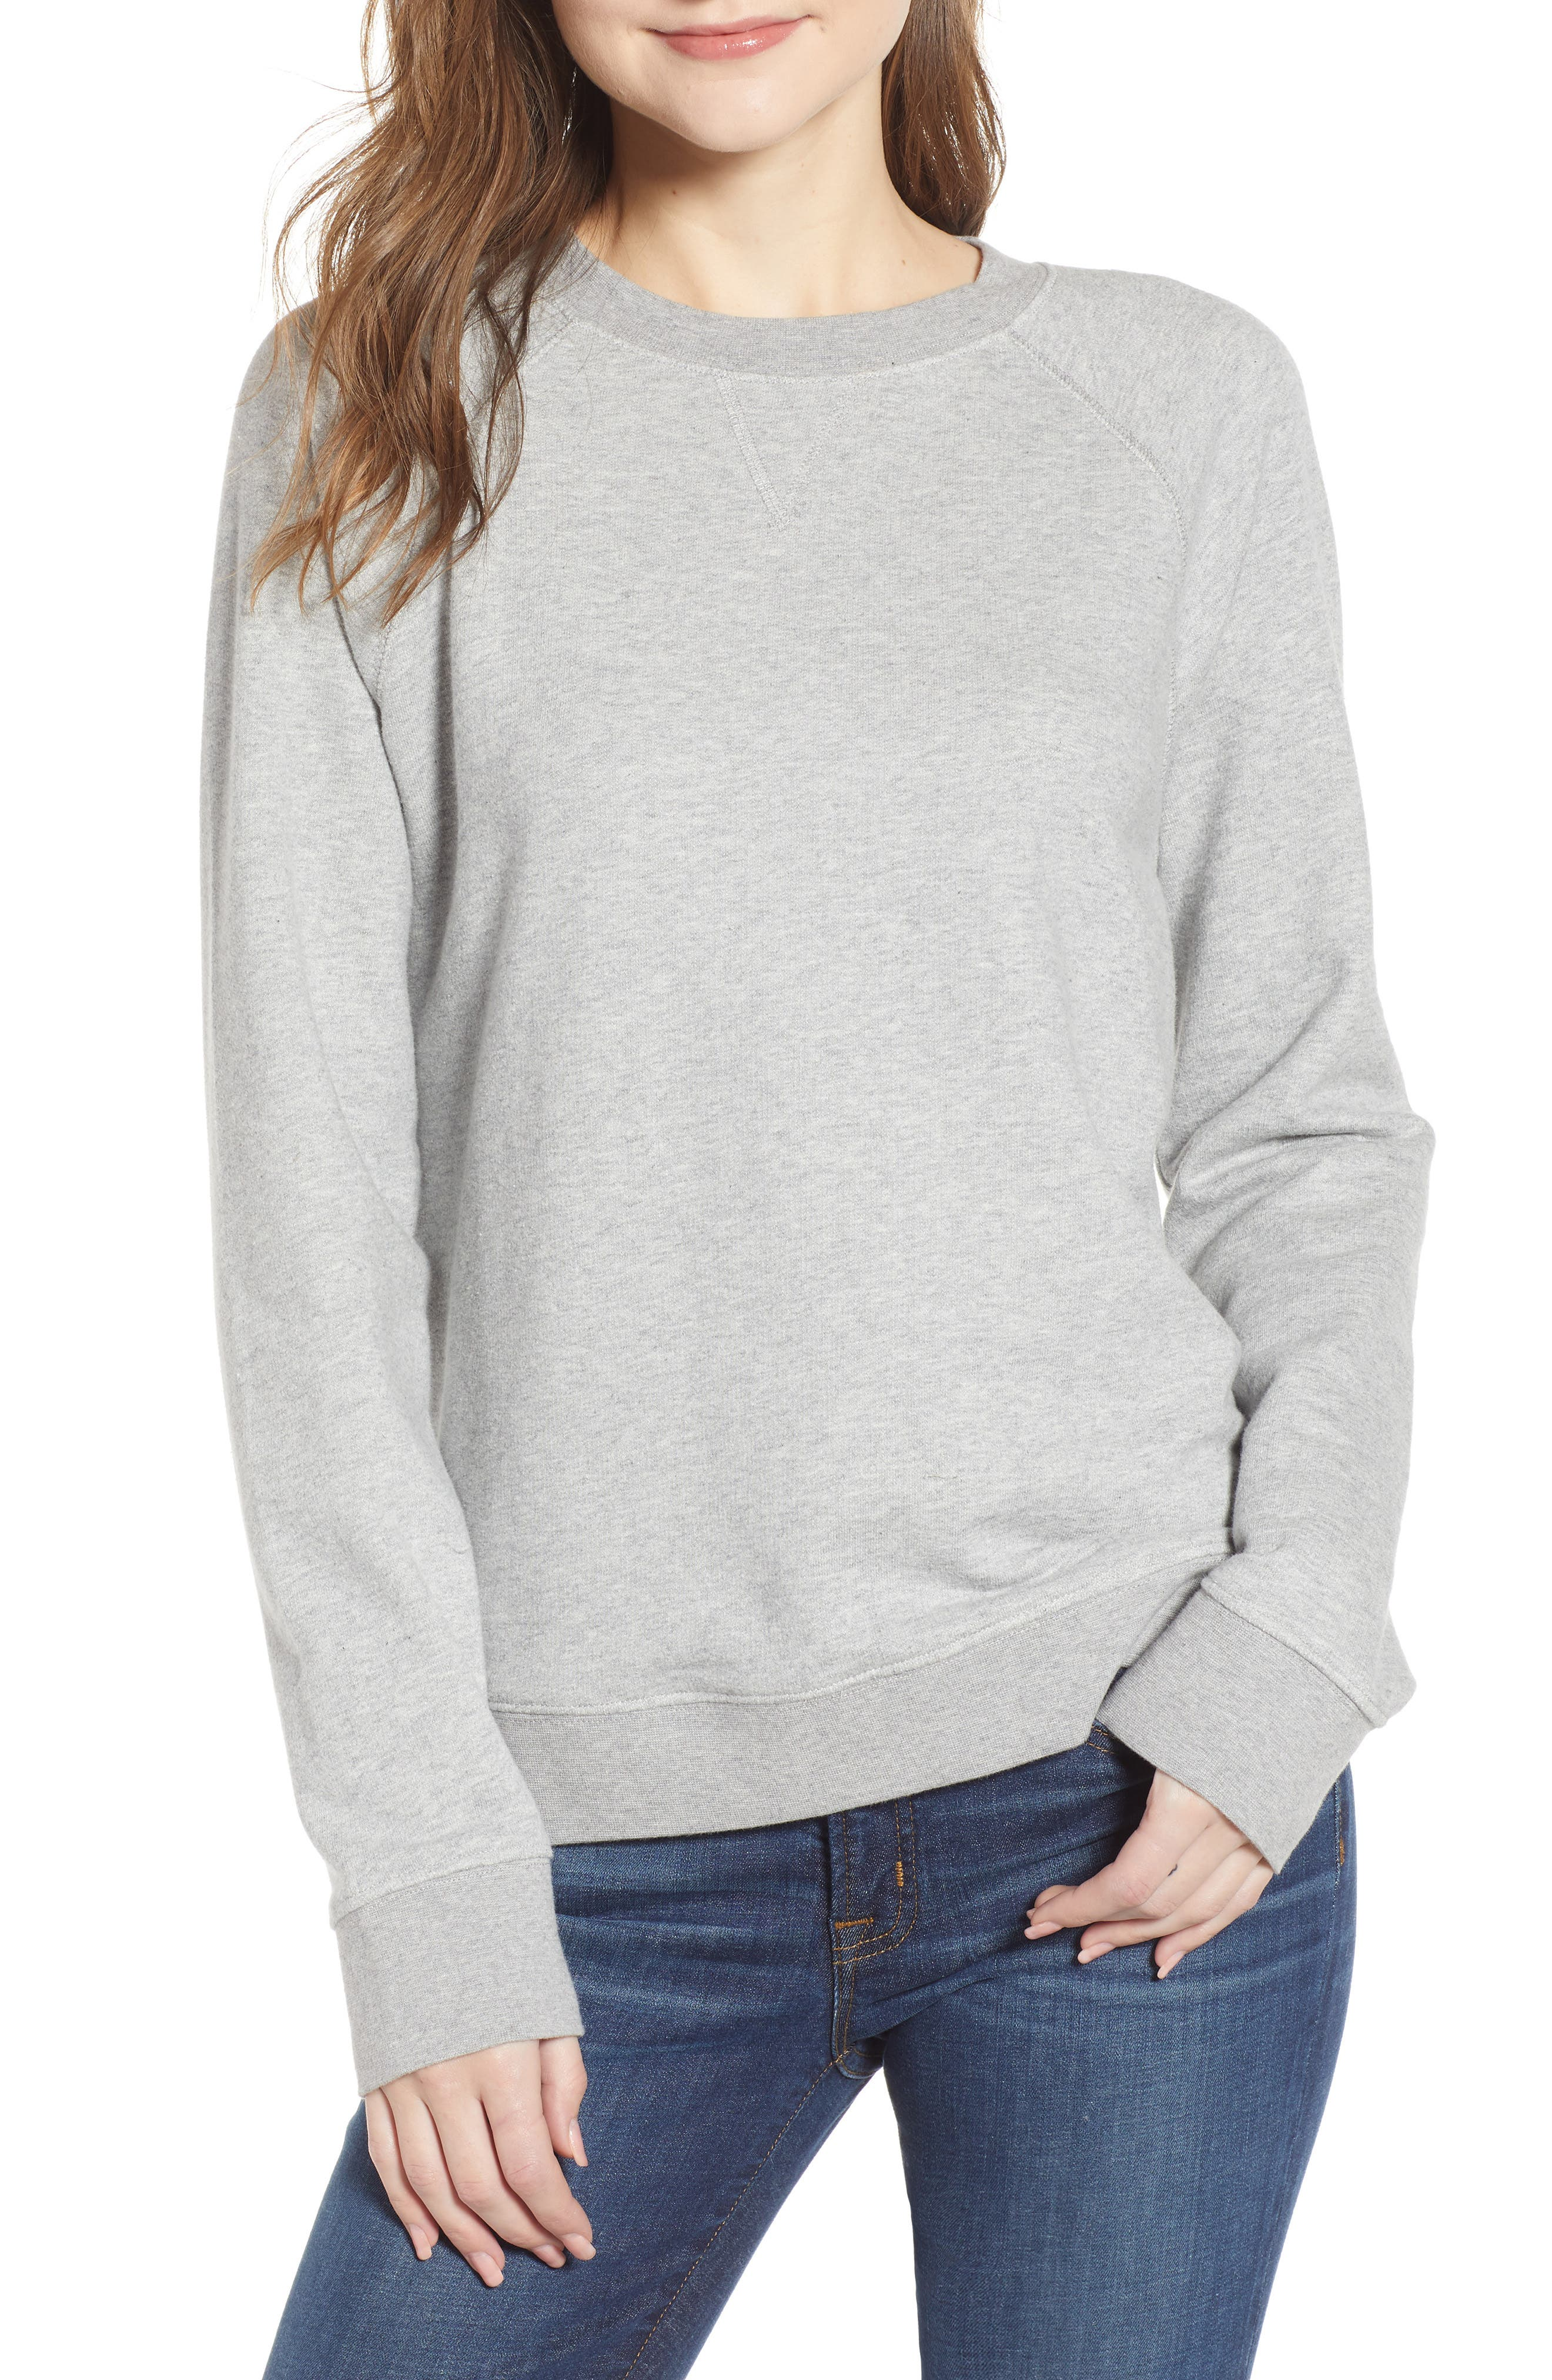 J.crew Garment Dyed Sweatshirt, Grey